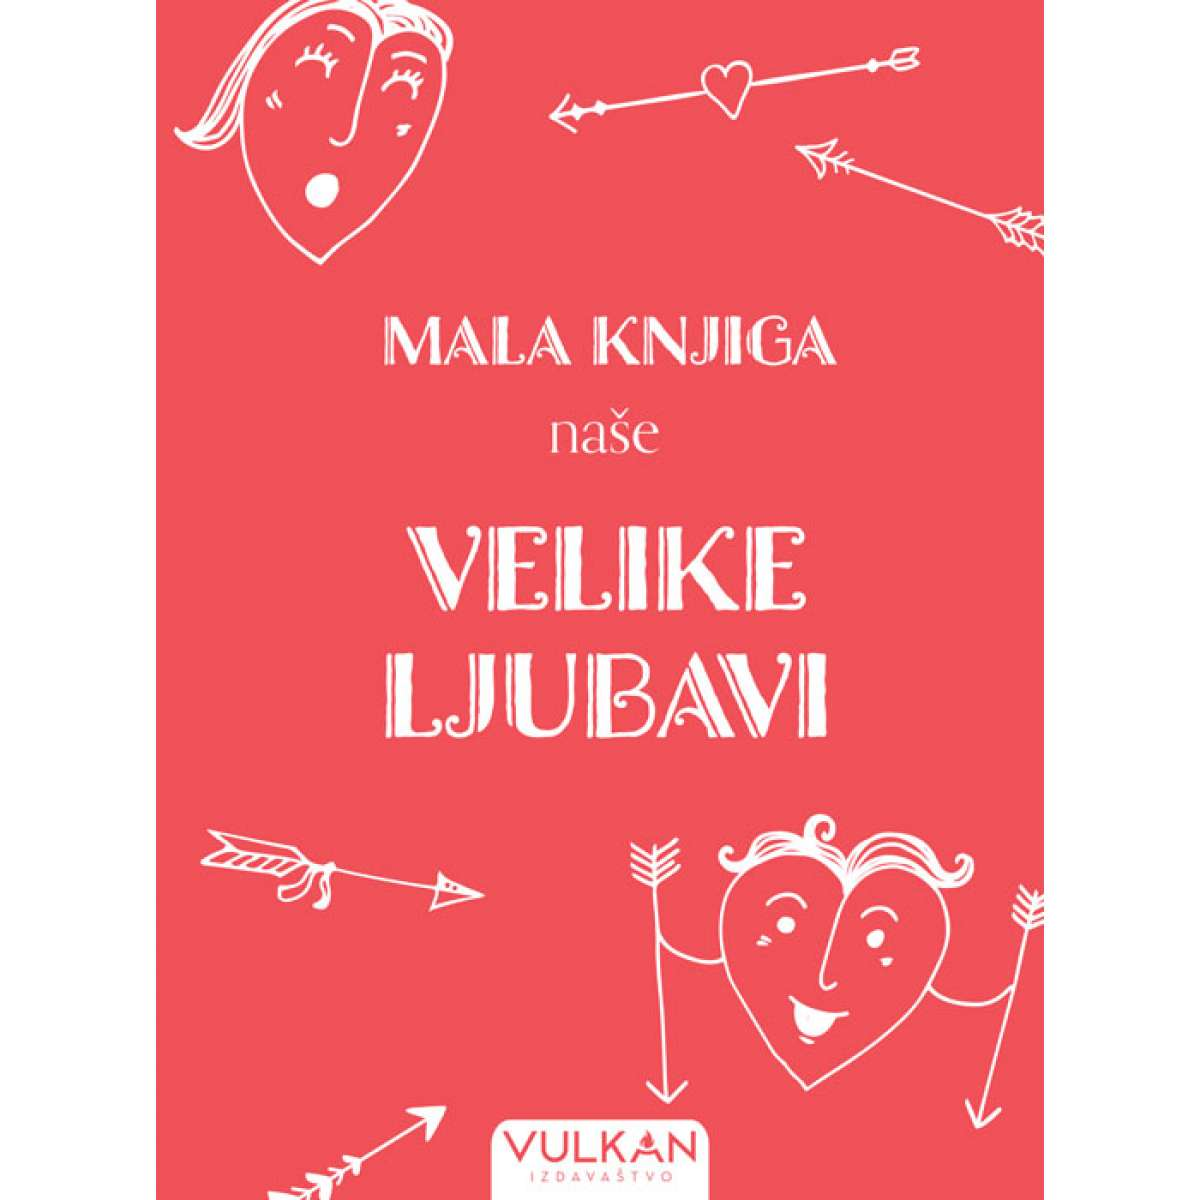 Mala knjiga naše velike ljubavi